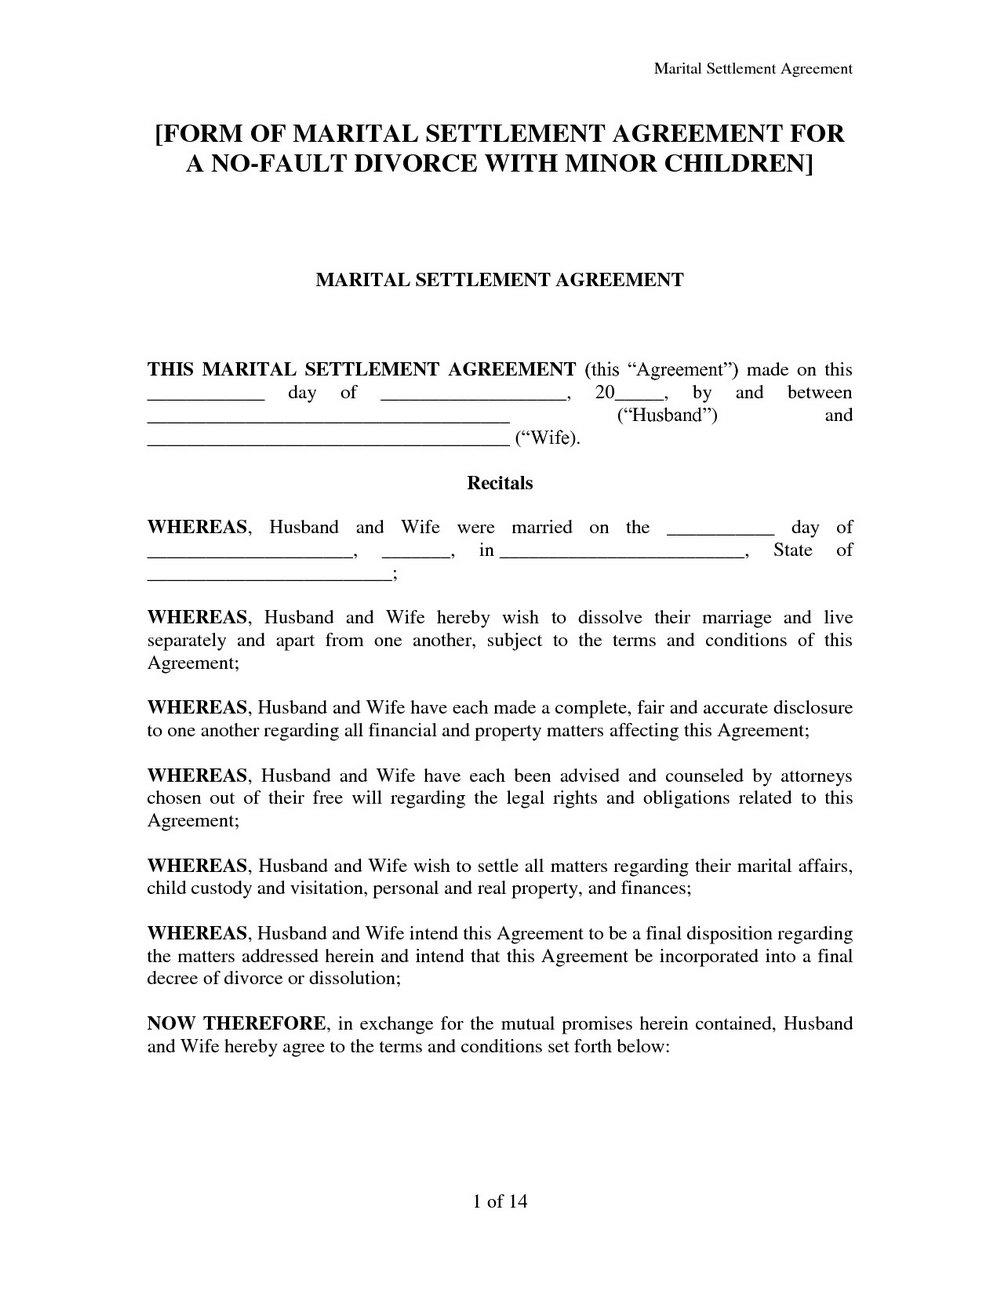 Marital Separation Agreement Form Virginia